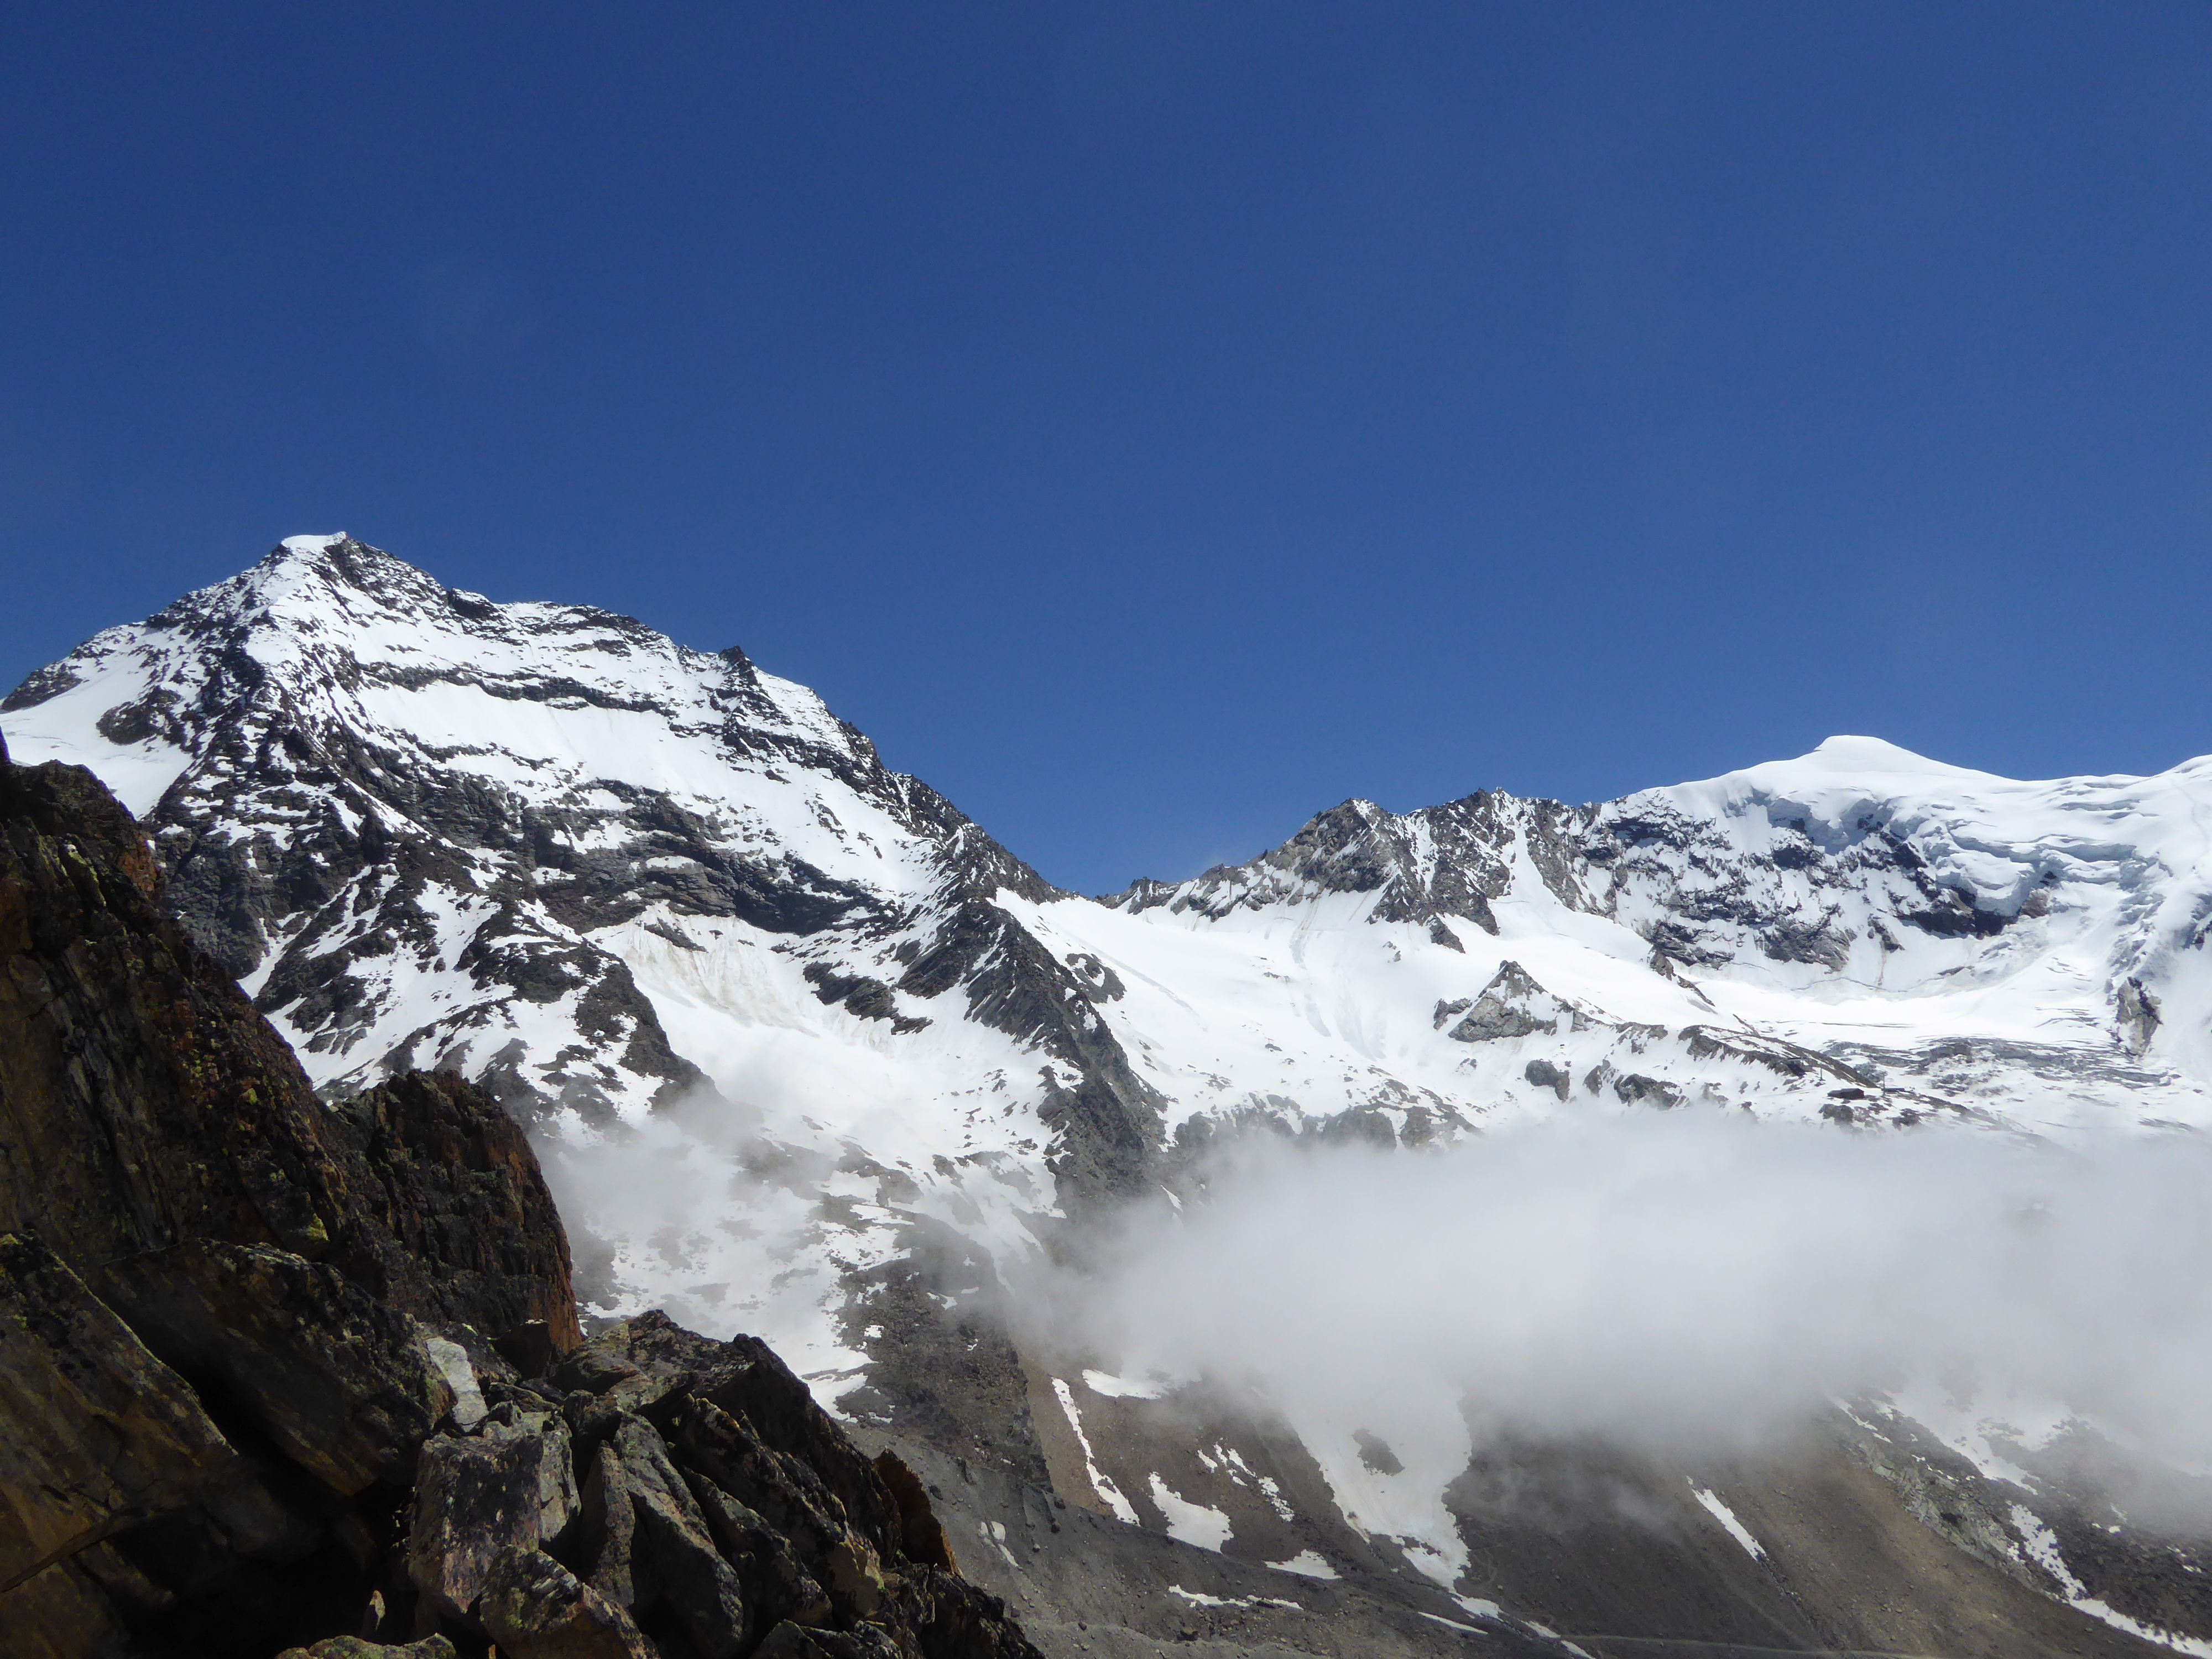 Klettersteig Jägihorn : Panorama klettersteig jägihorn kreuzboden kletterseig